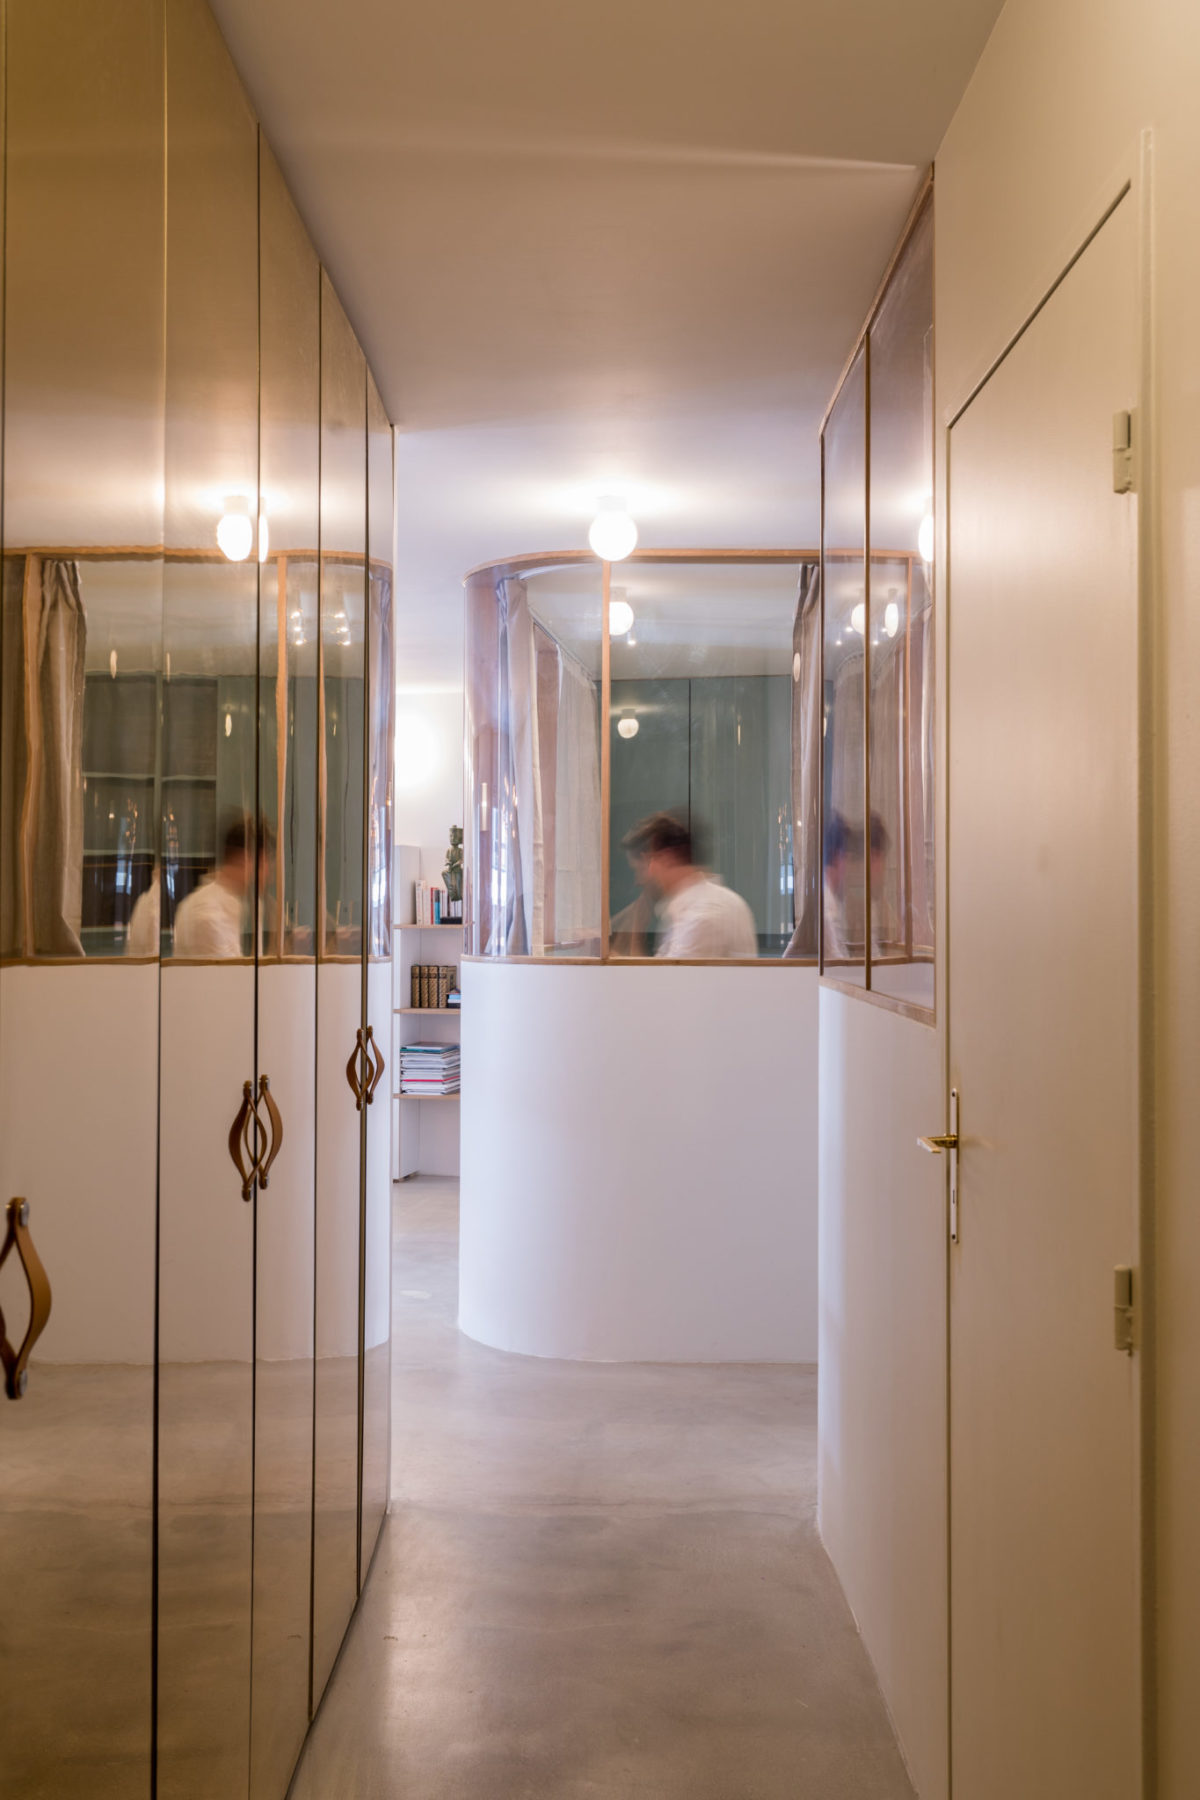 Couloir - Placards / dressing avec miroir bronze, Ikea pax, poignées cuir